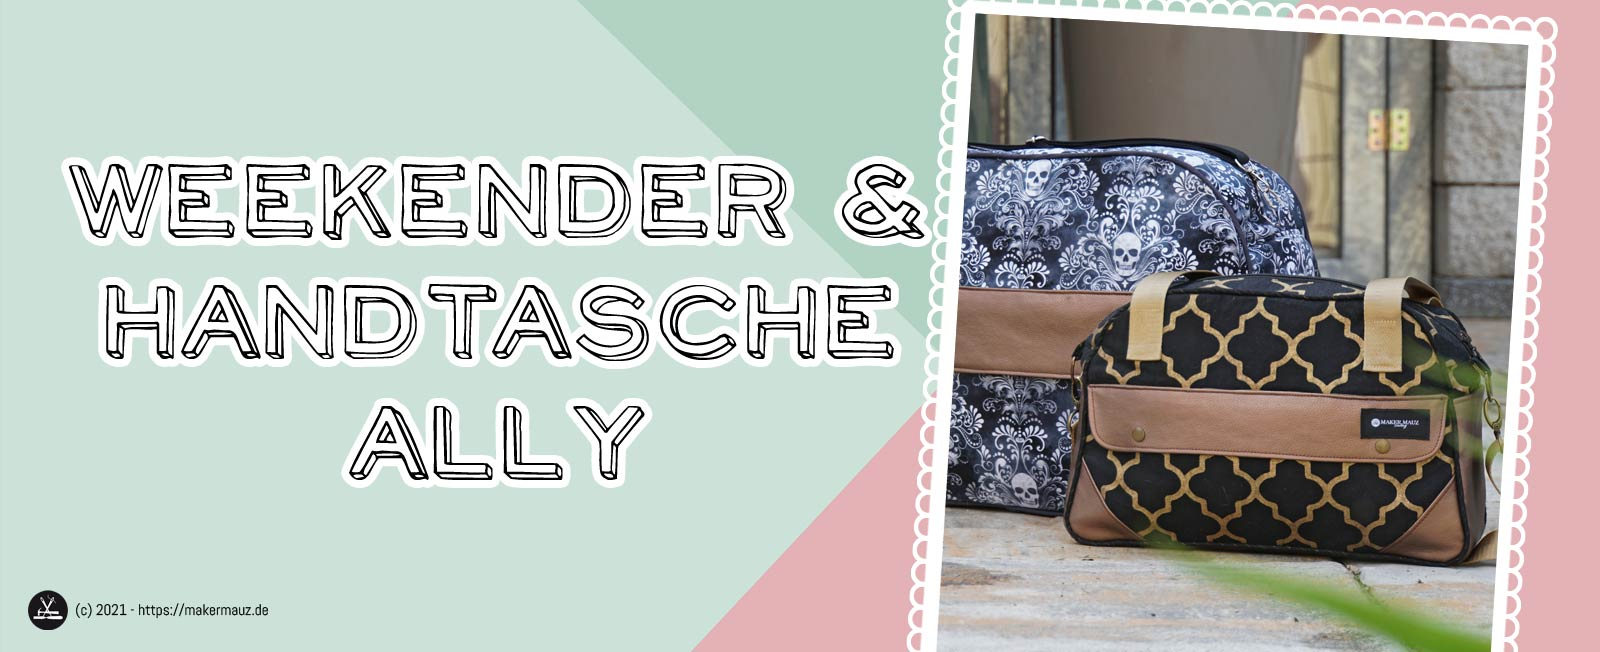 Weekender + Handtasche Ally Schnittmuster und Nähanleitung